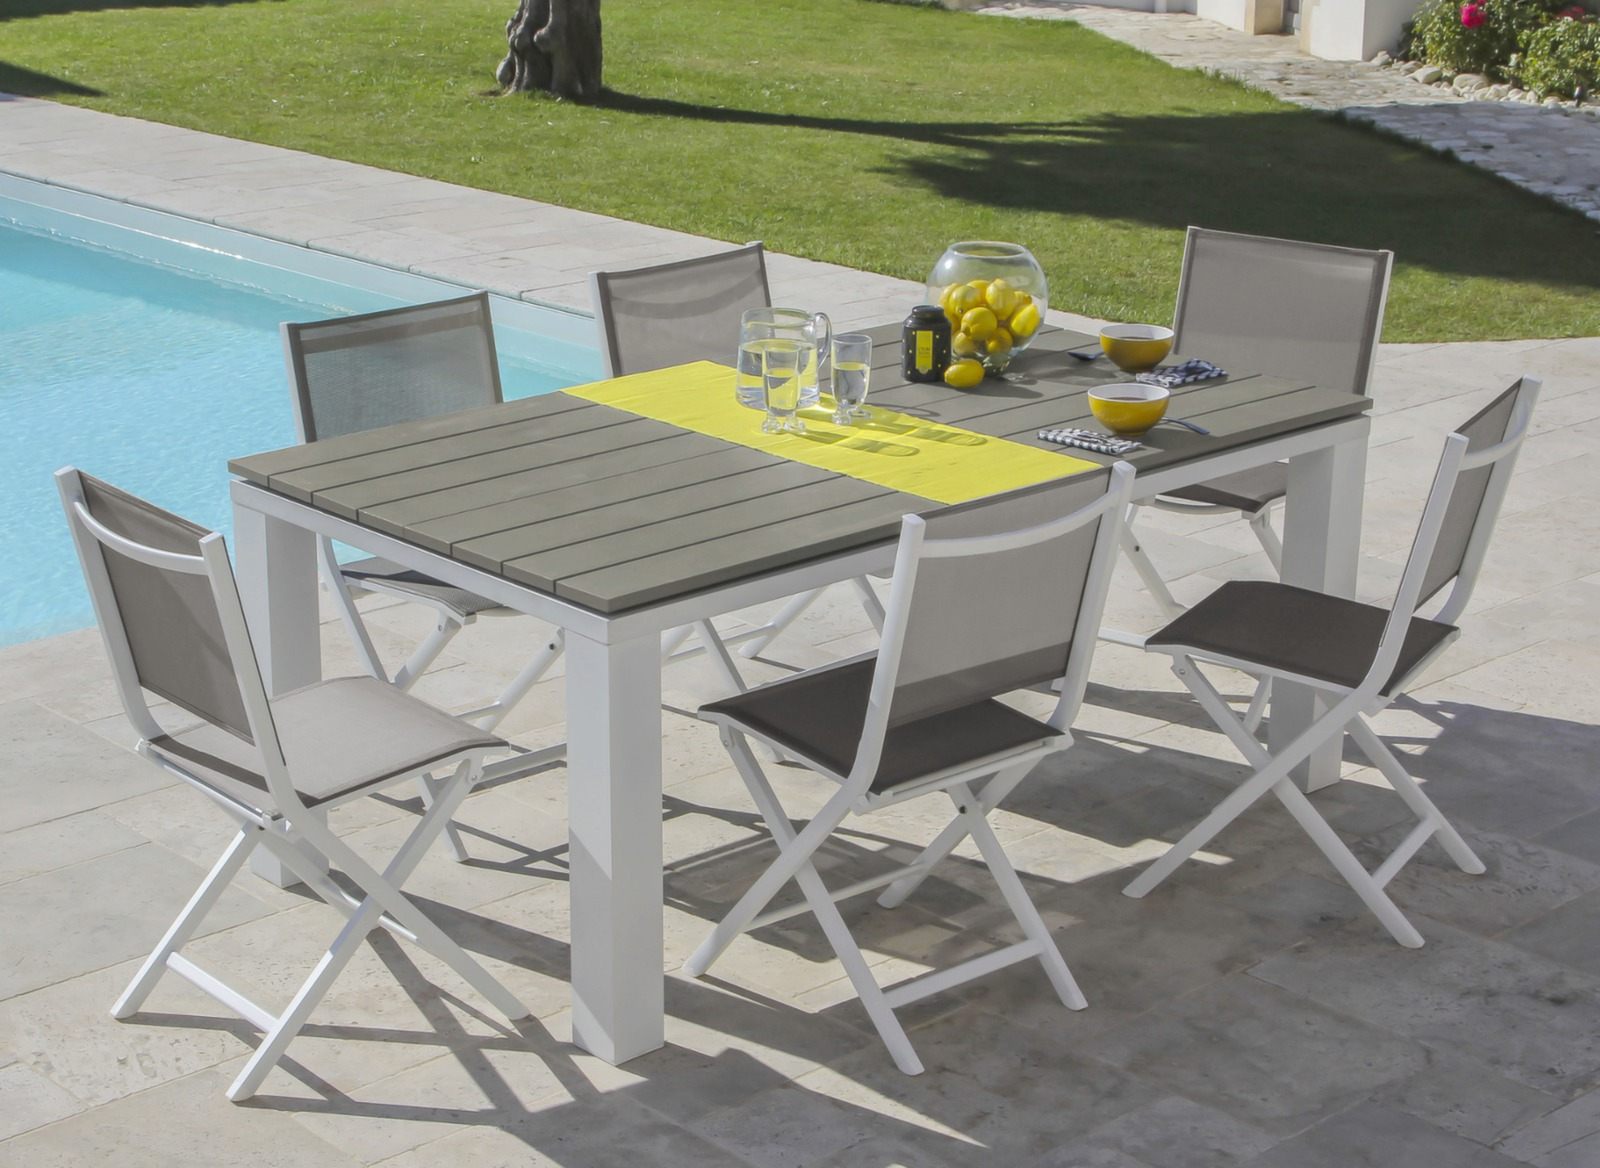 Table Elena - Tables fixes - Mobilier de jardin design Proloisirs